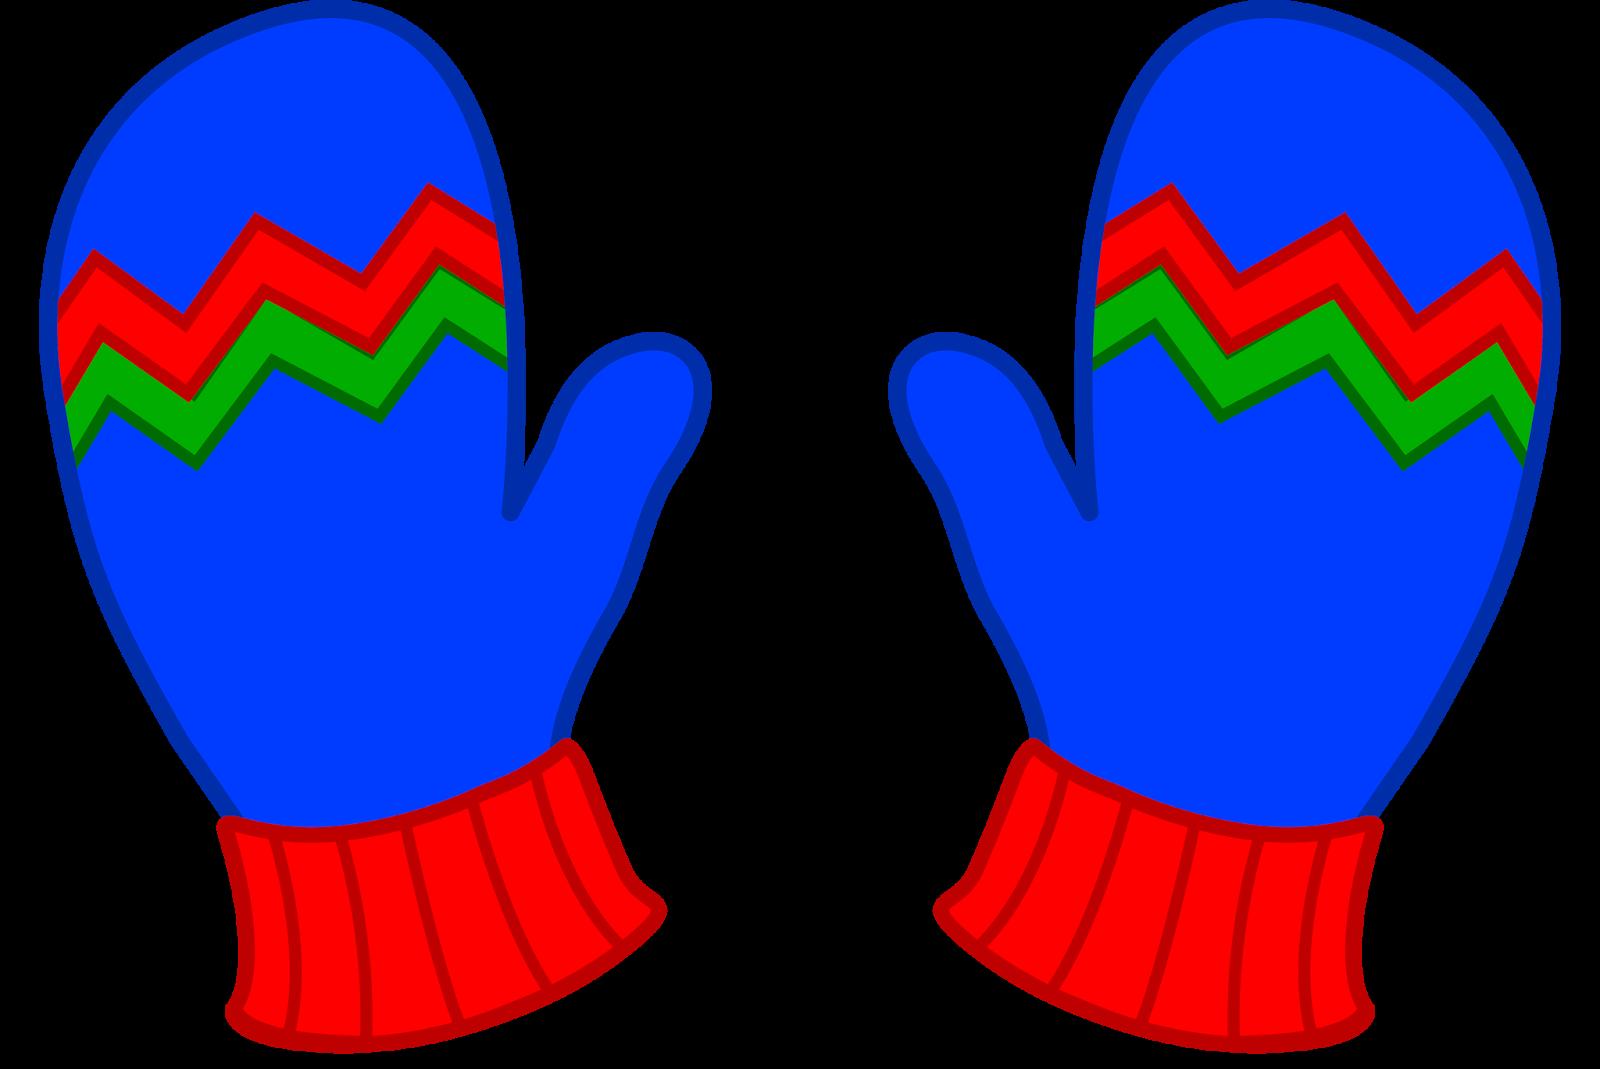 Snowman mittens clipart clip stock Gloves clipart snowman, Gloves snowman Transparent FREE for ... clip stock